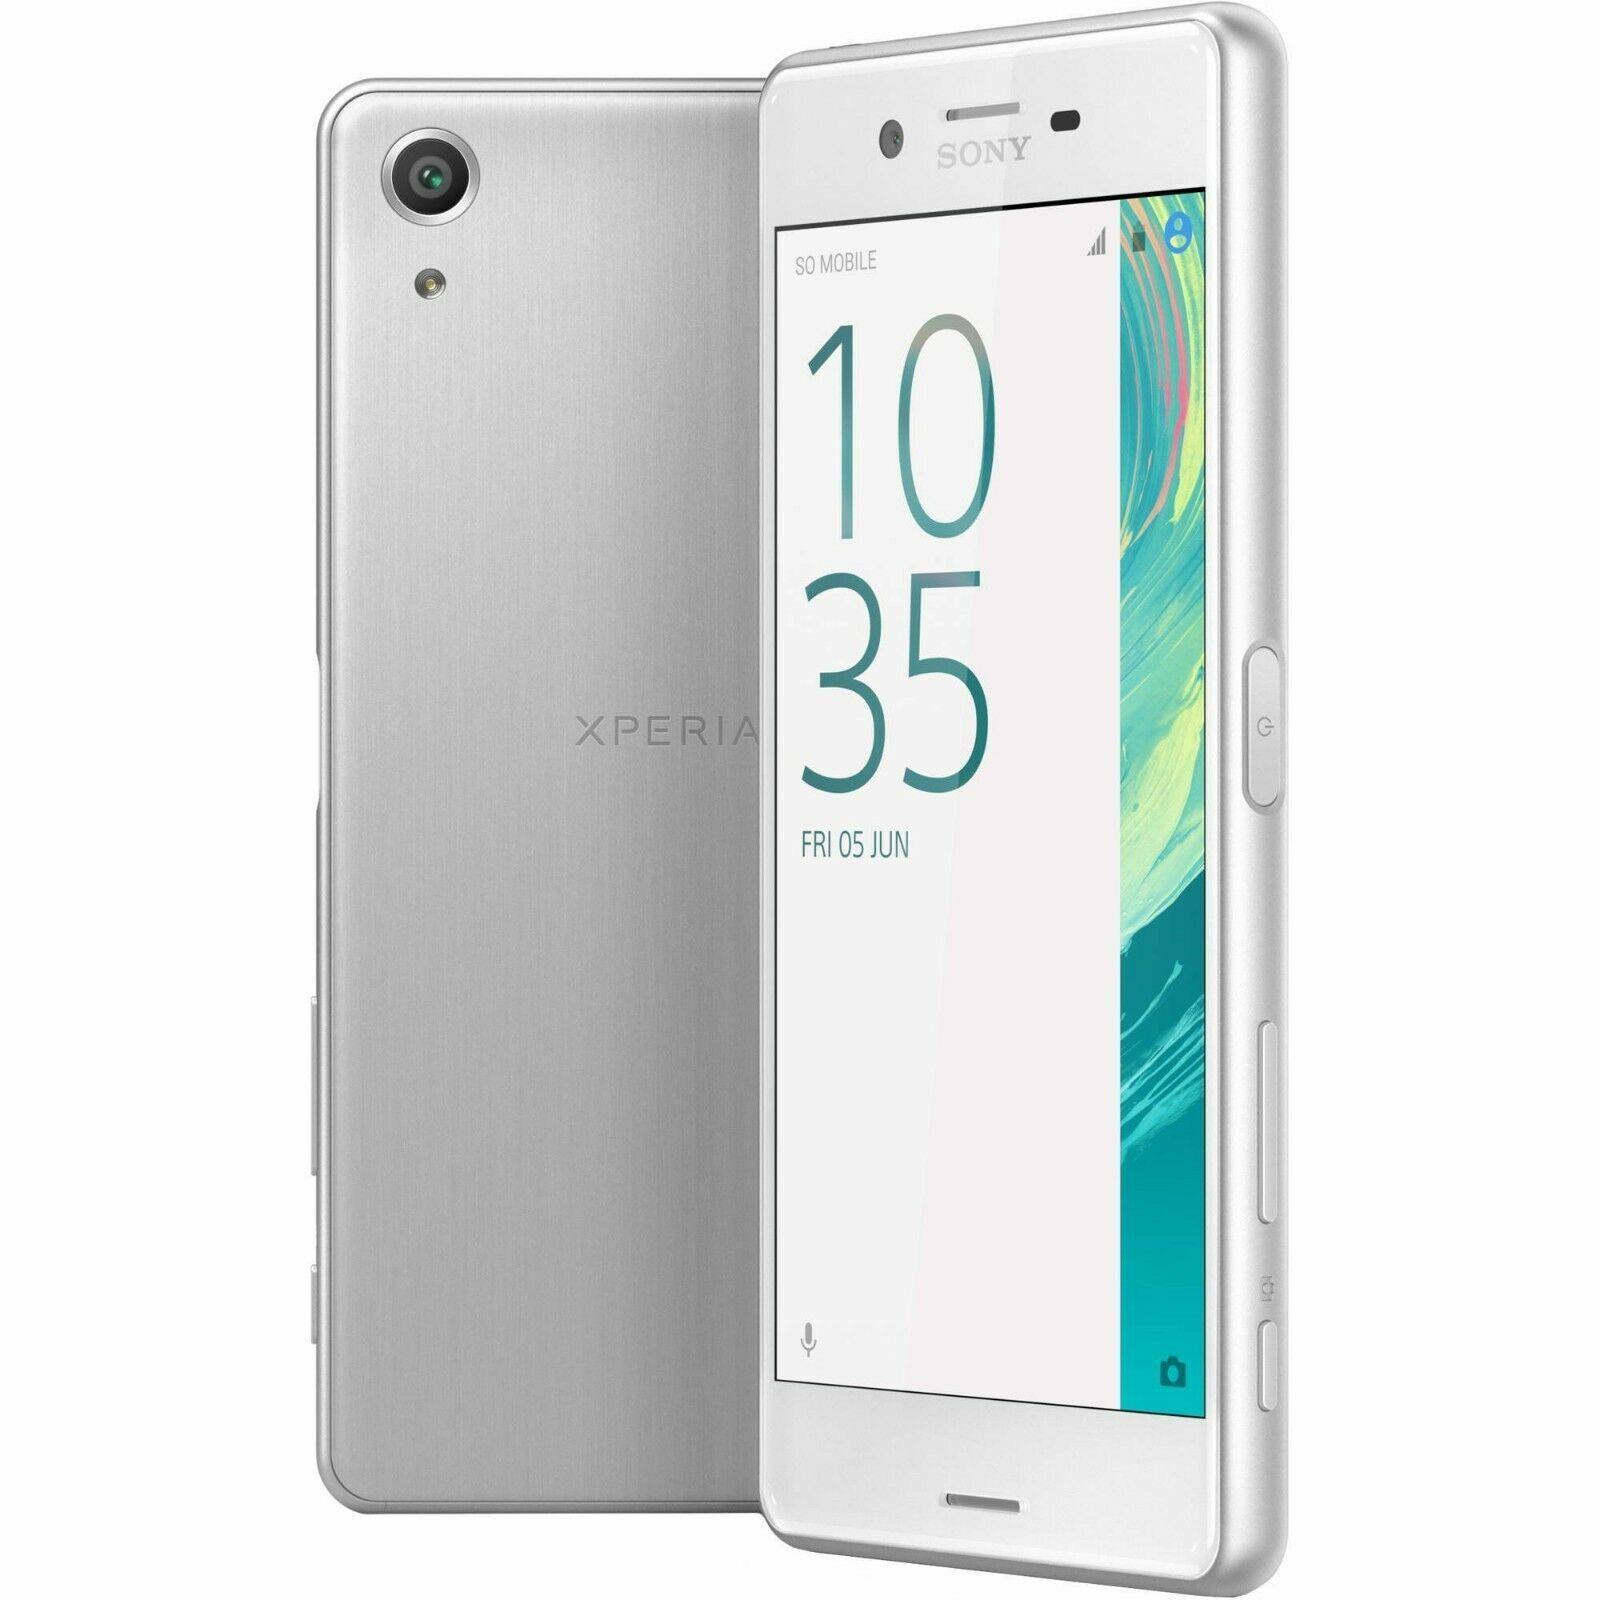 Sony Xperia X Performance F8131 - 32GB - White (Unlocked) Smartphone